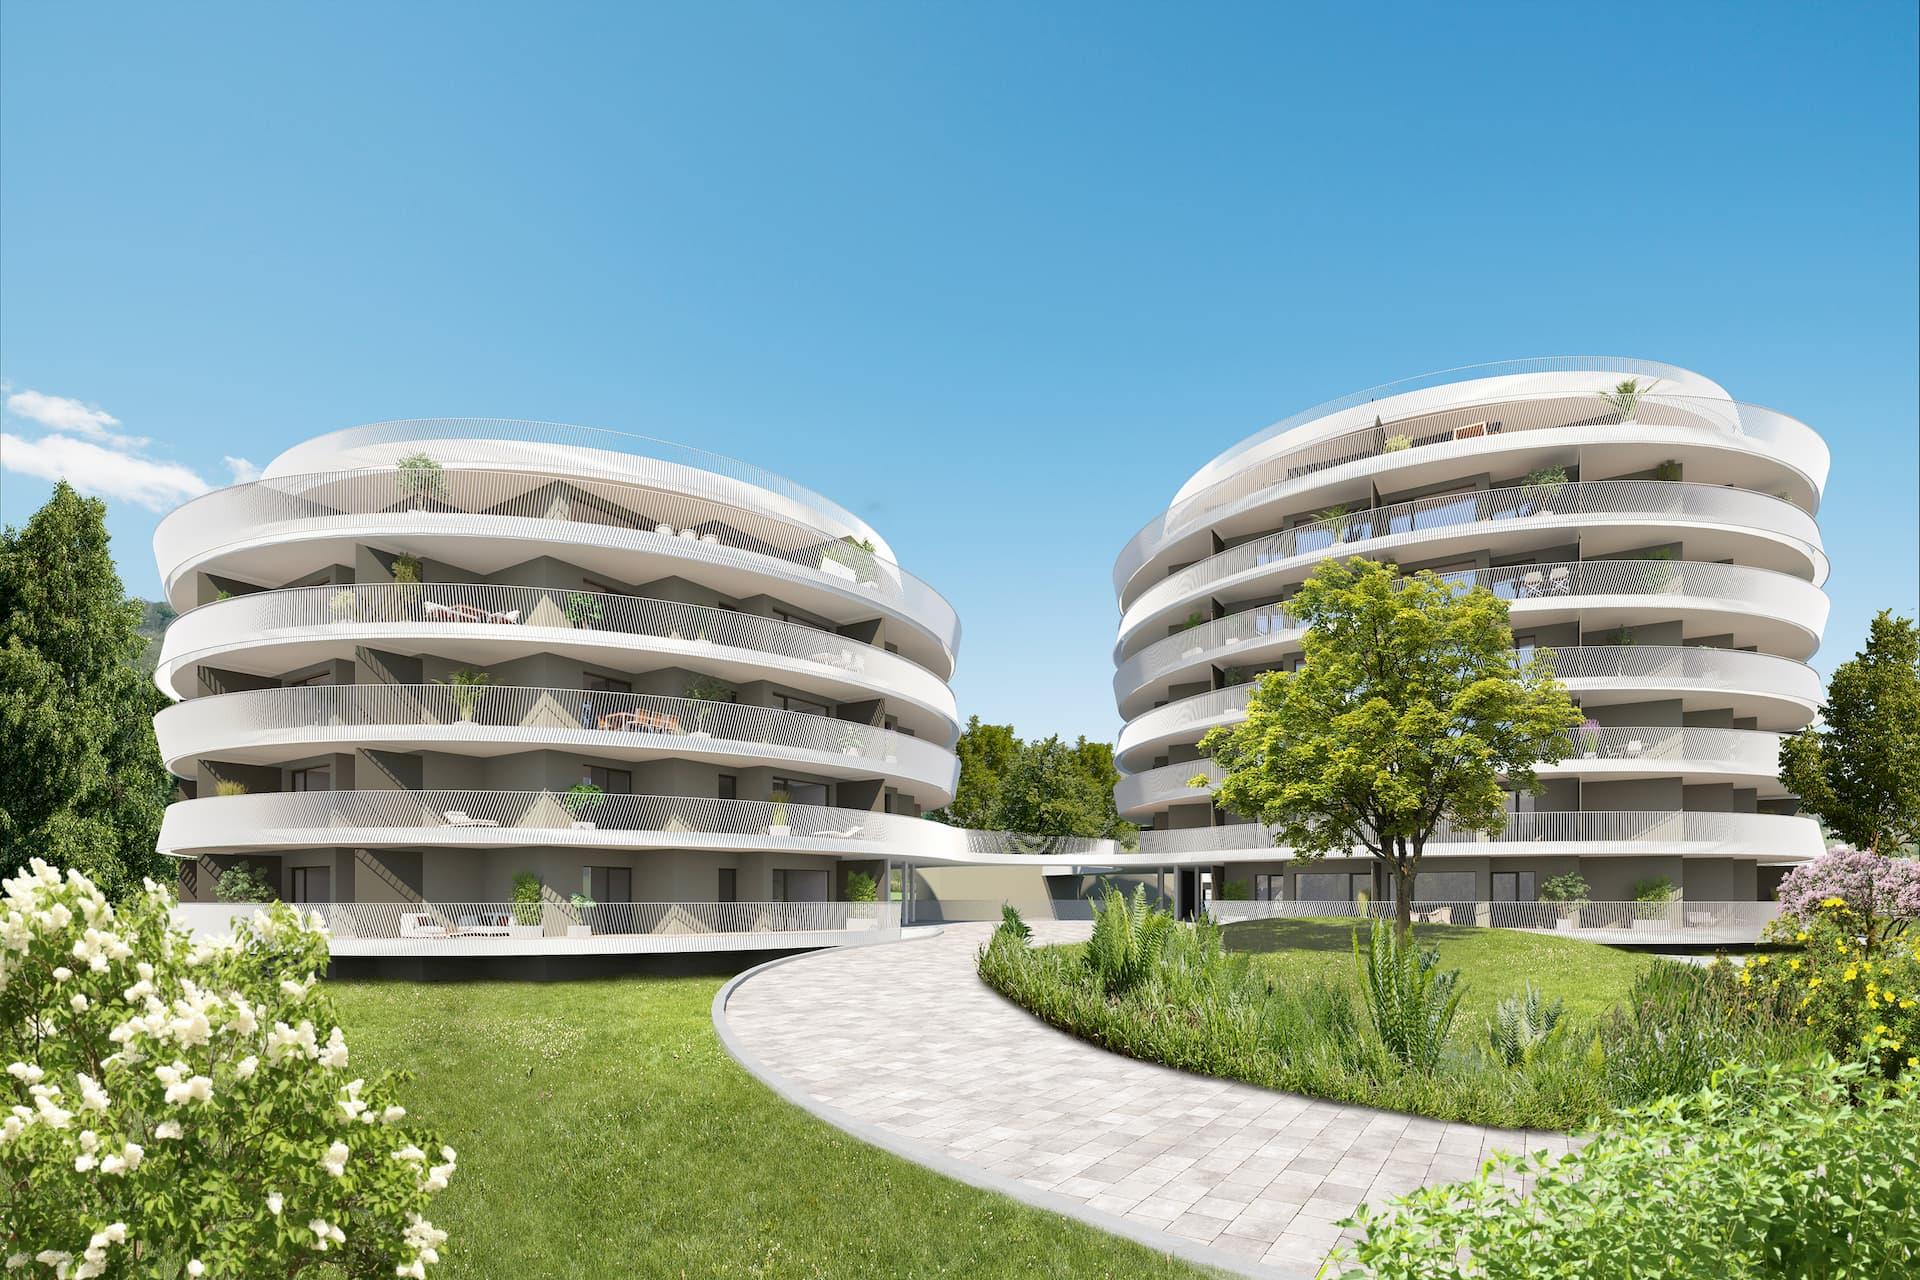 Aussenansicht Bauherrenmodell Green Paradise IFA